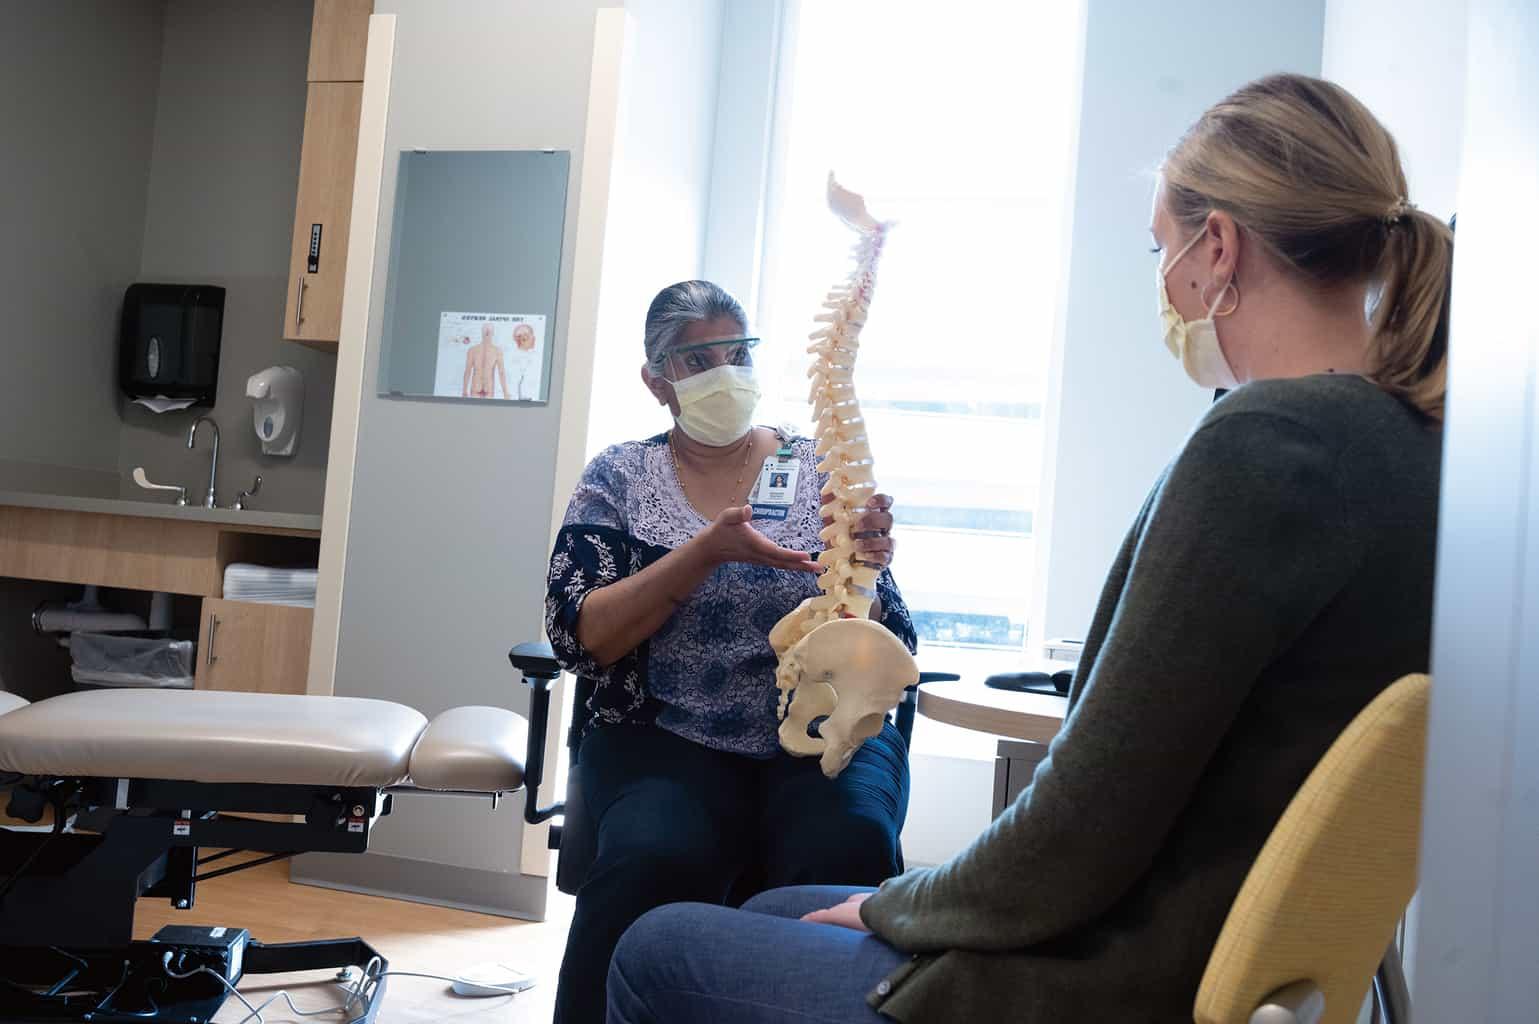 chiropractor showing spine model patient